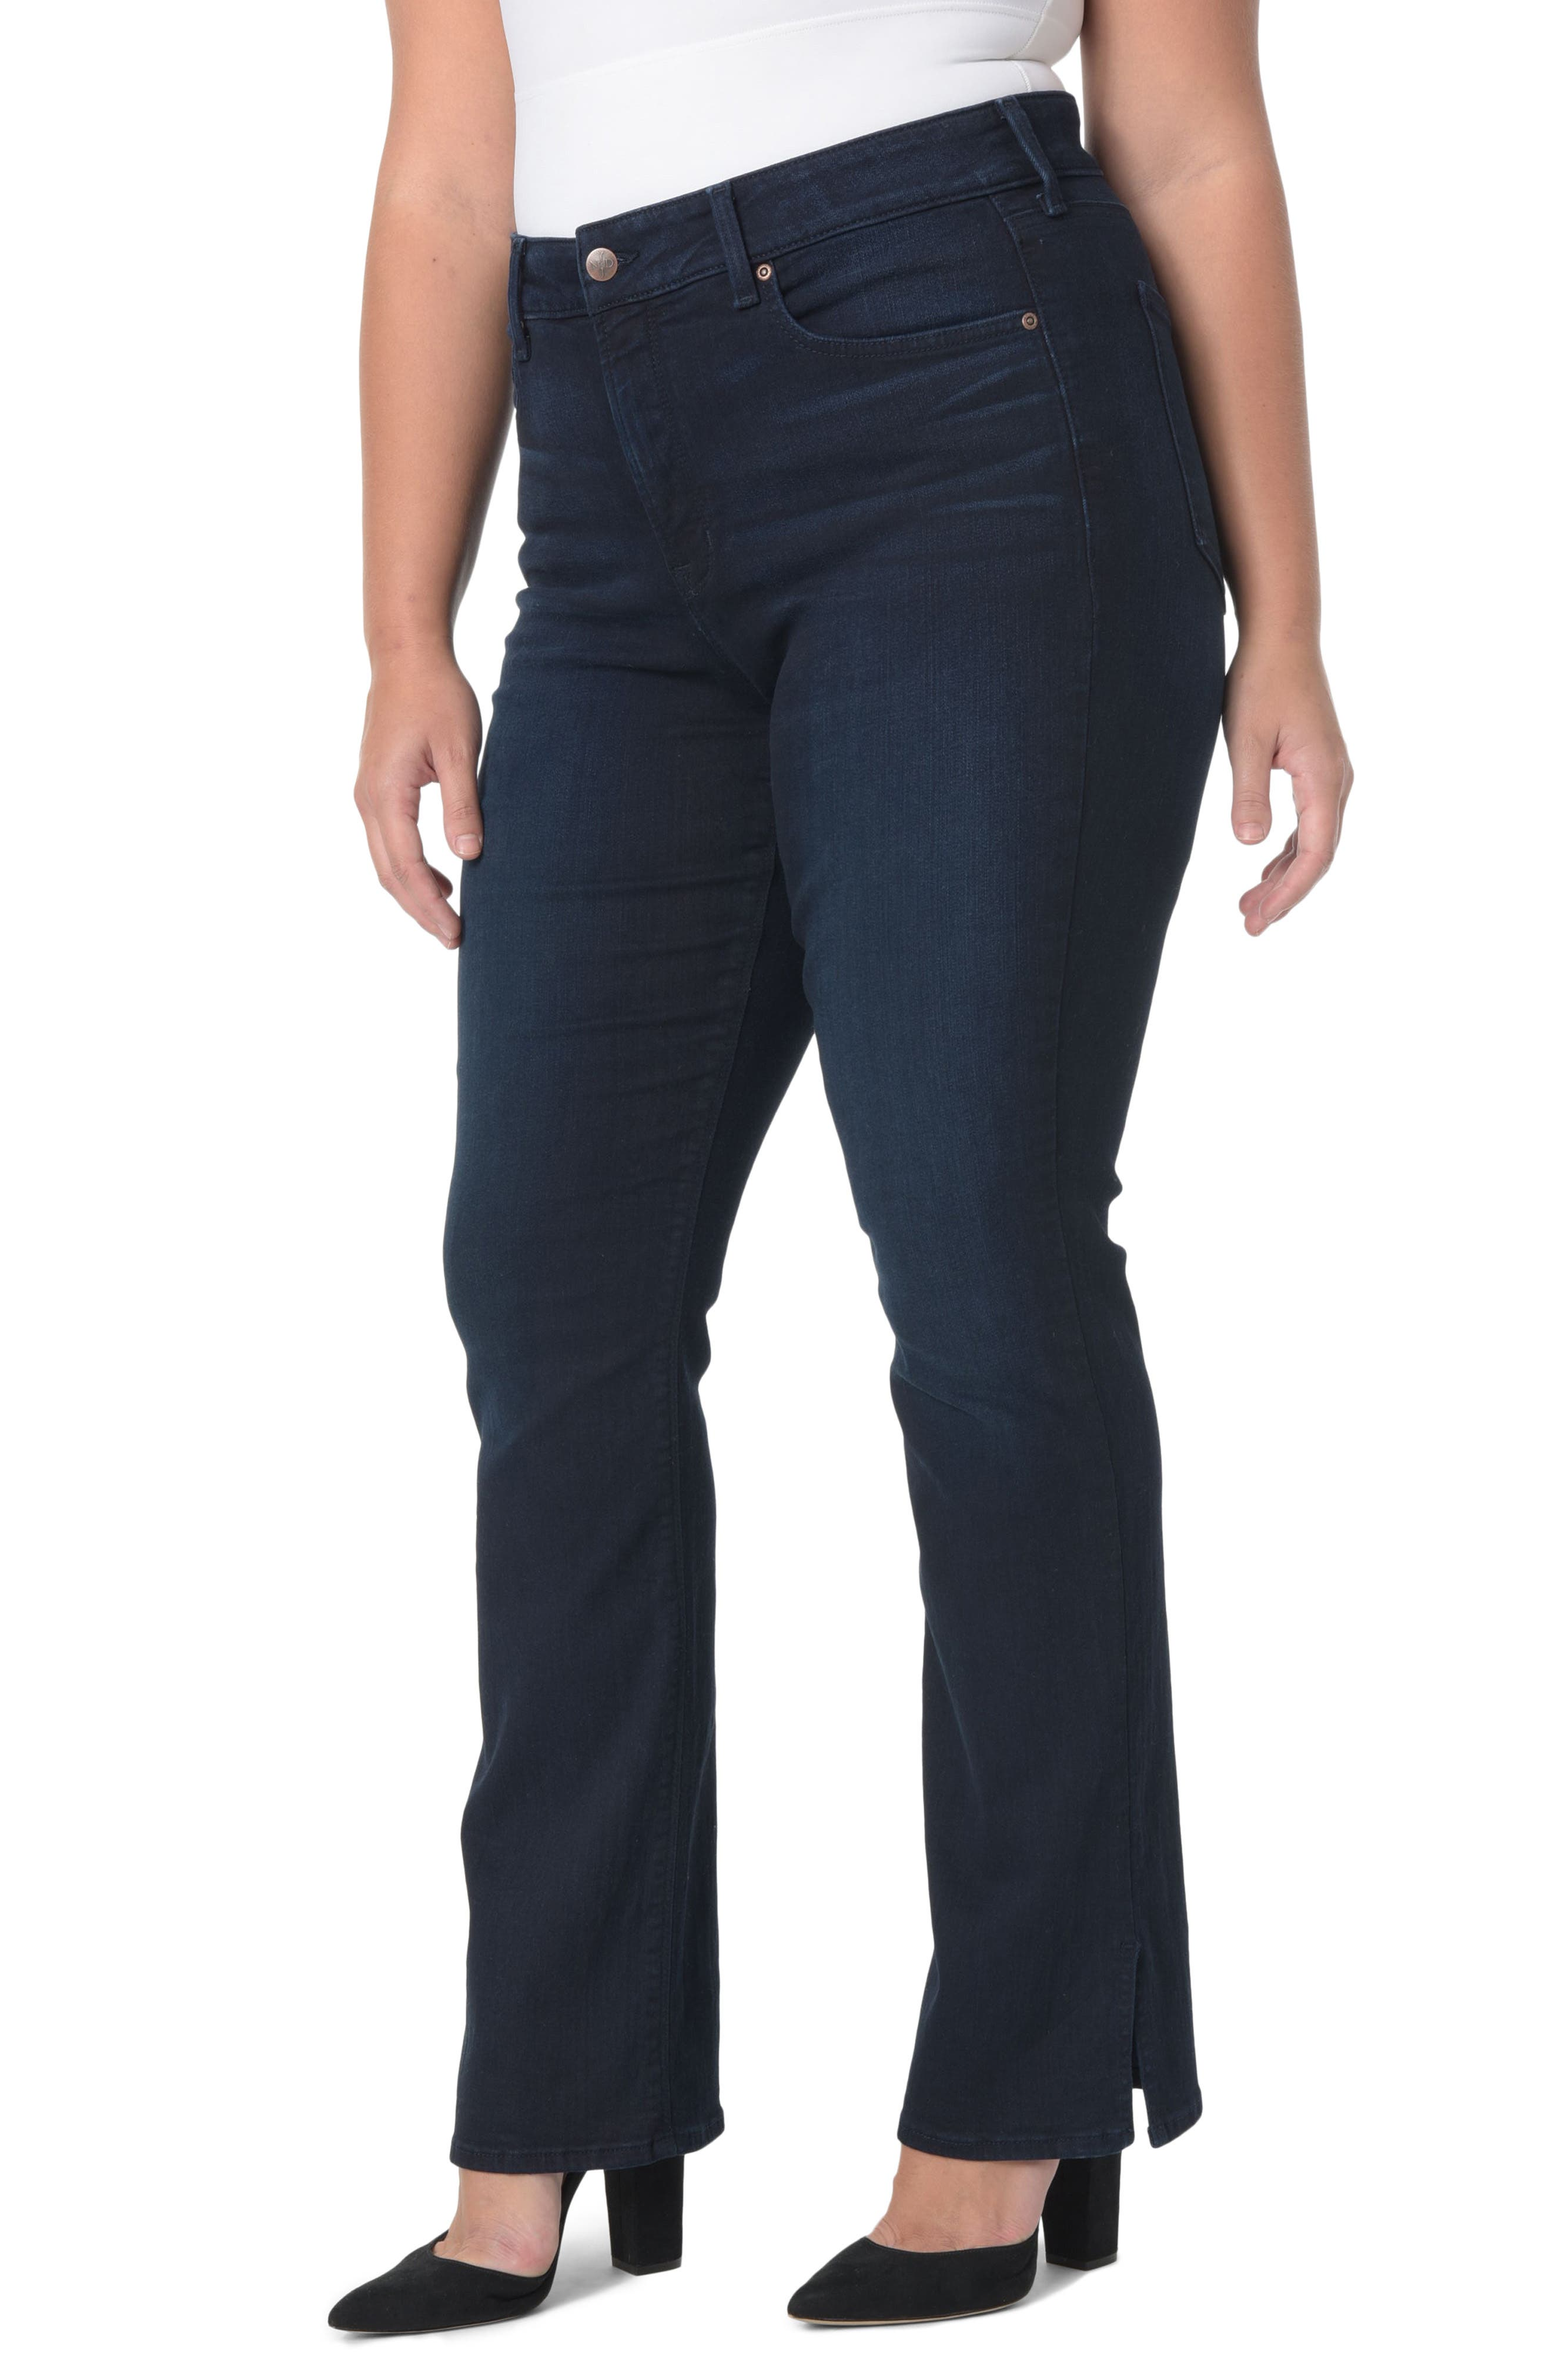 NYDJ Billie Stretch Mini Bootcut Jeans (Sinclair) (Plus Size)